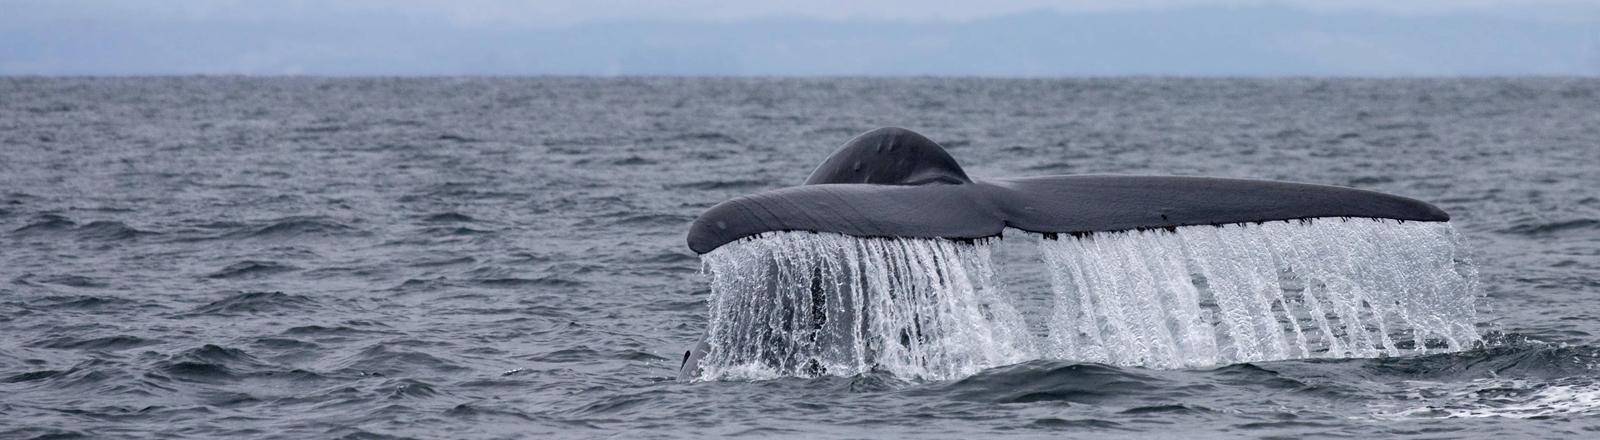 Blauwal in US-Gewässern